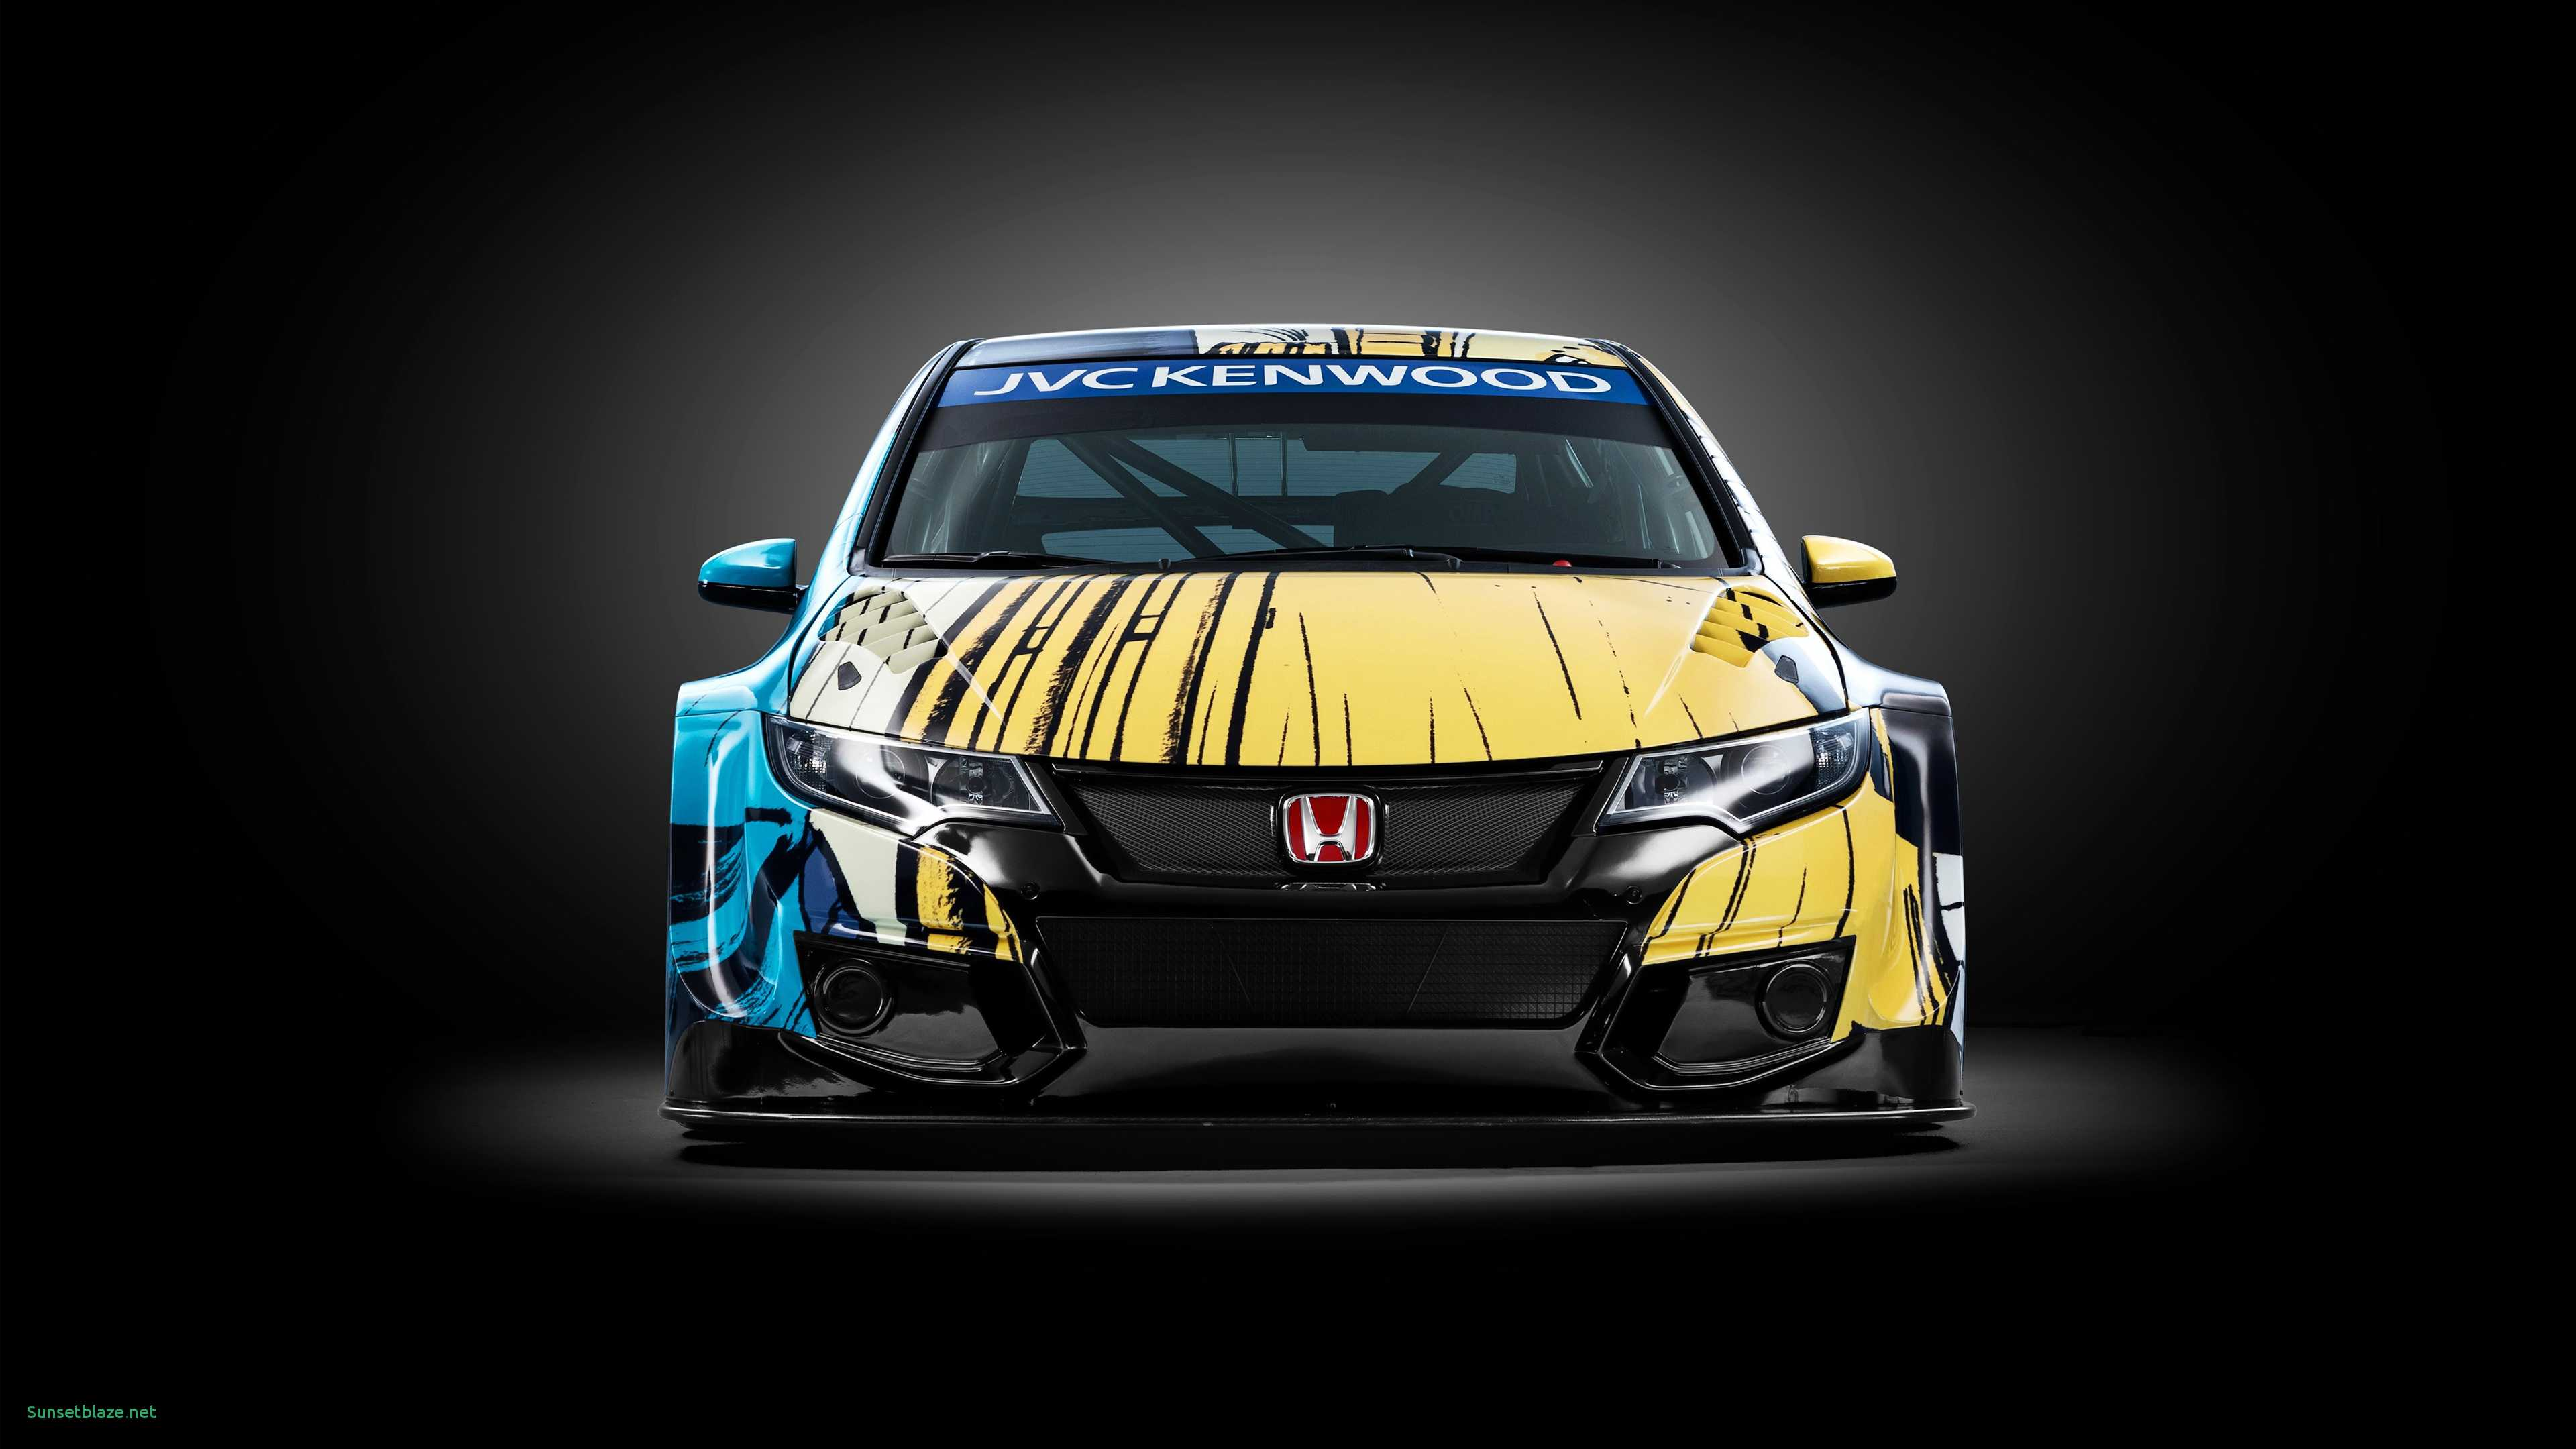 Honda Civic Wtcc Hd Inspirational Honda Cars Wallpapers Hd